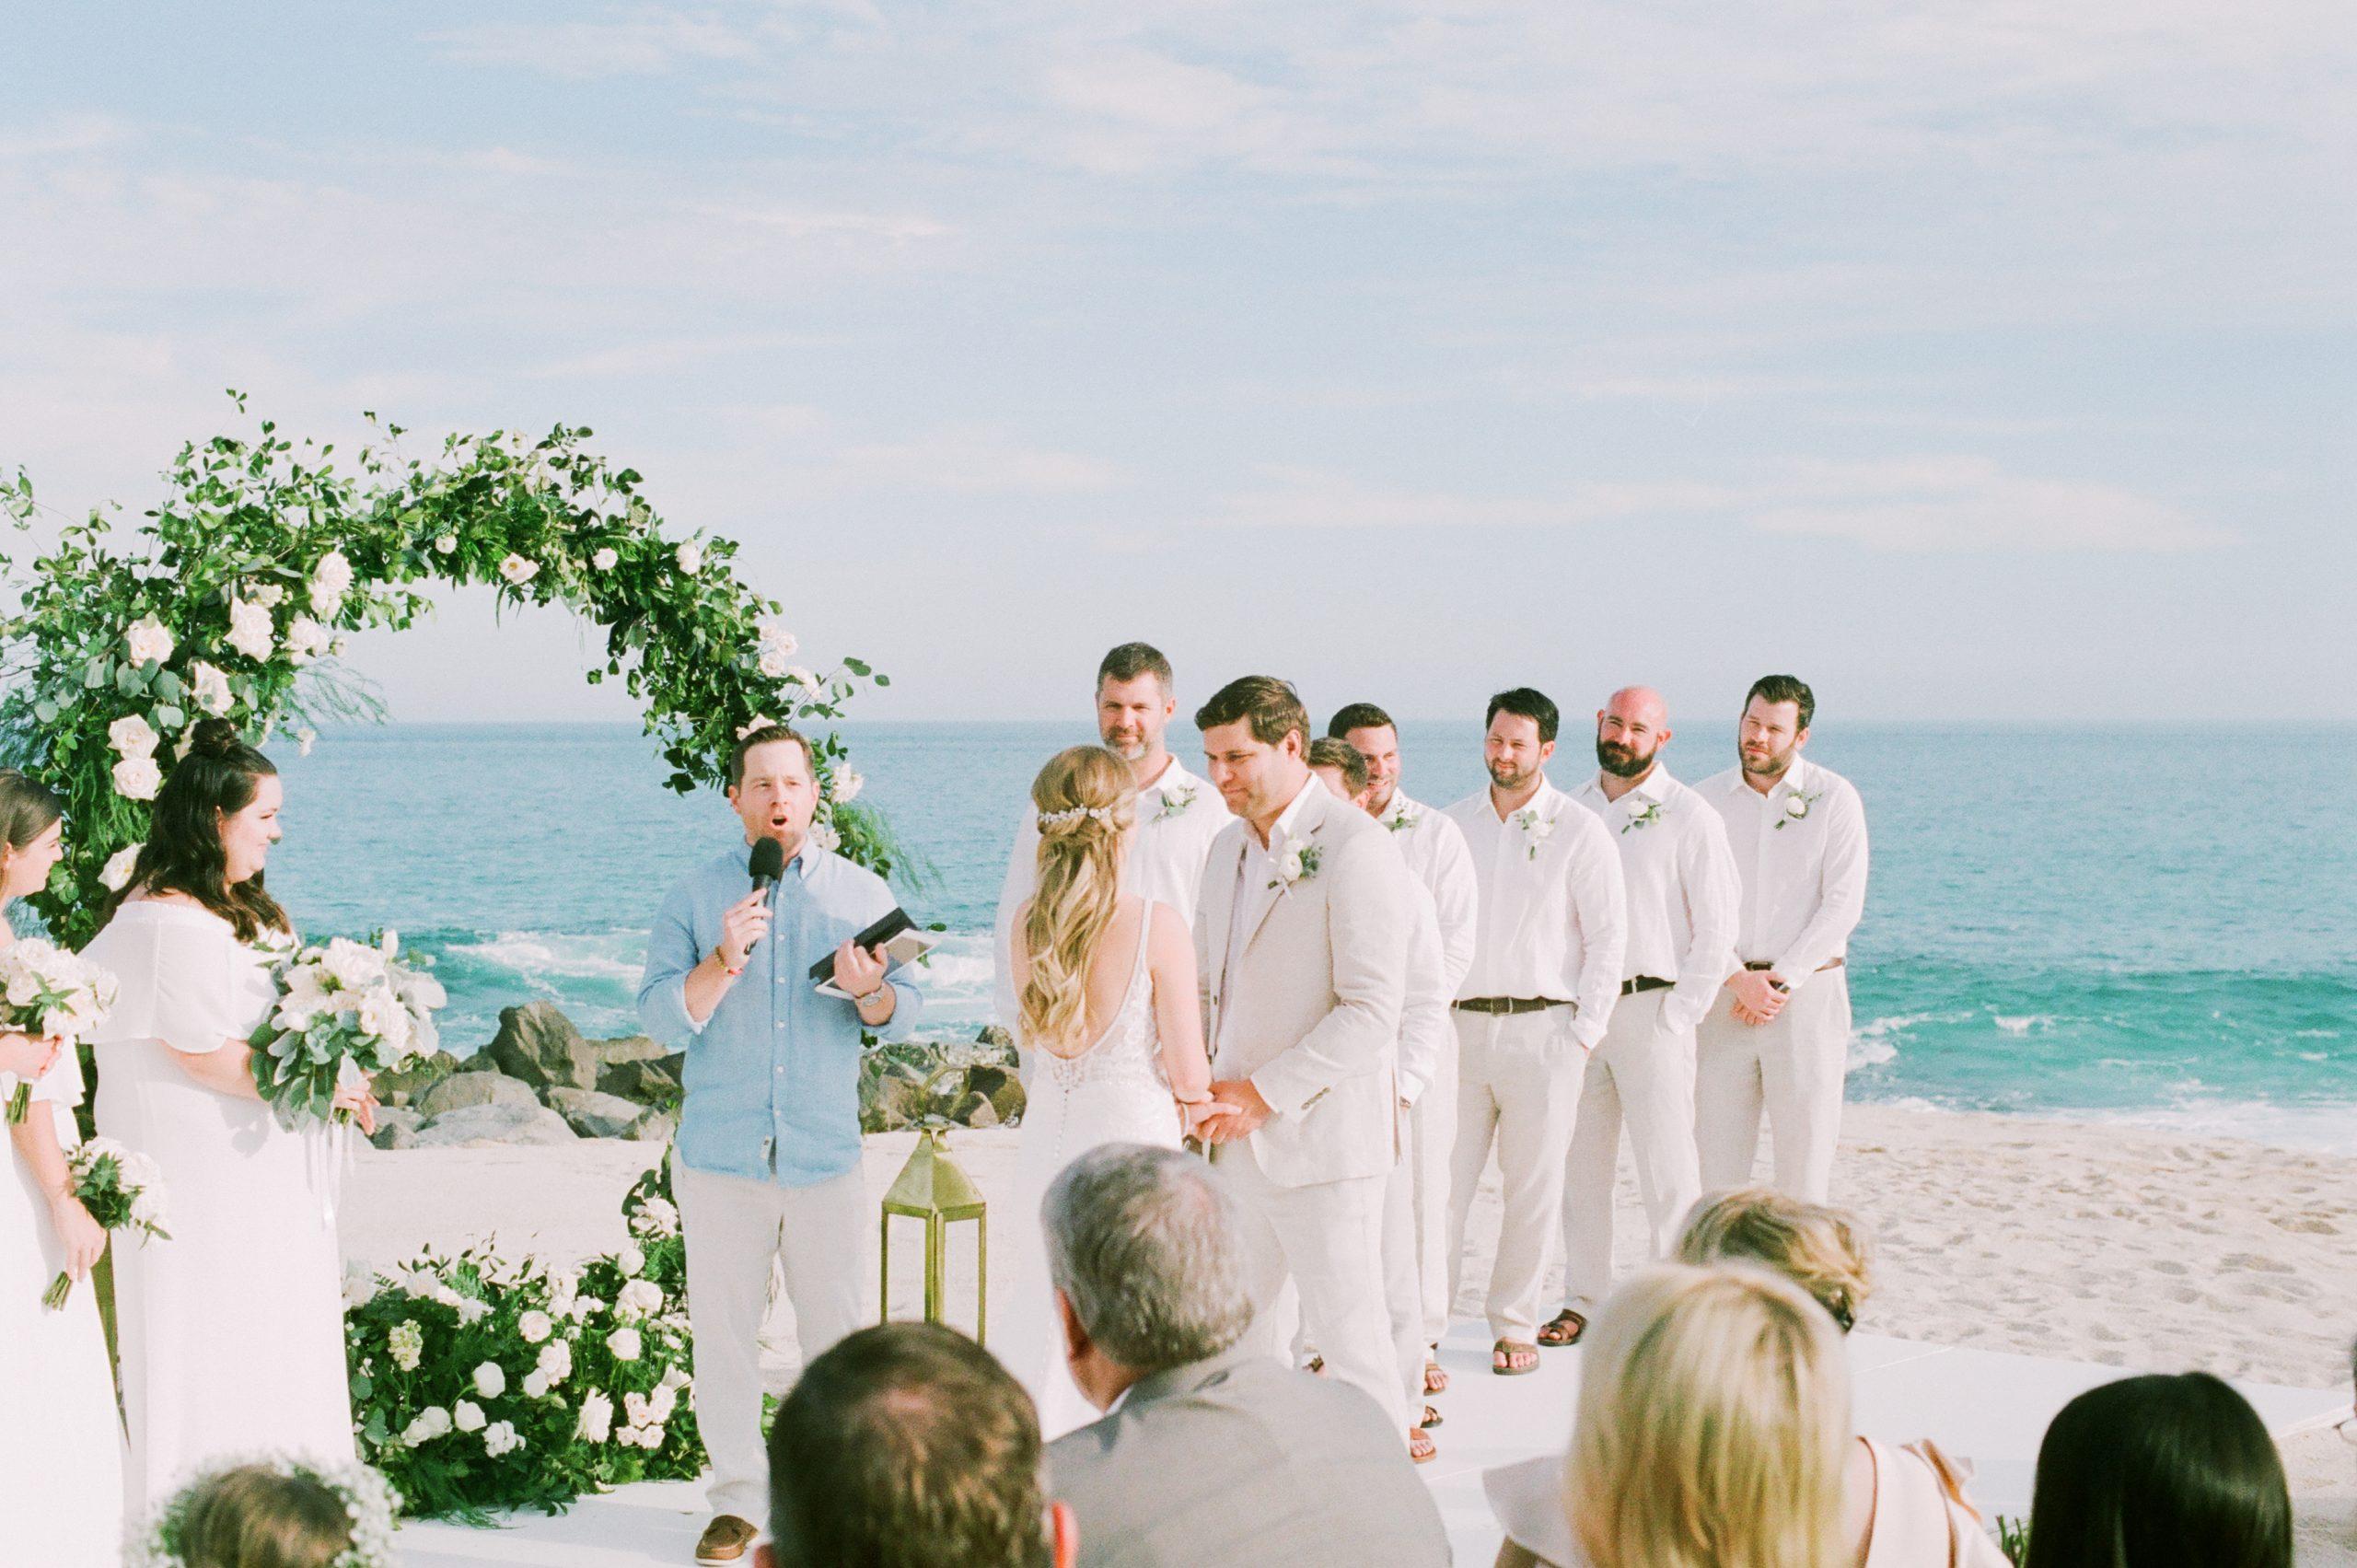 Mariah_Ryan_Sloane_Photo_Destination_Wedding_Photographer-2